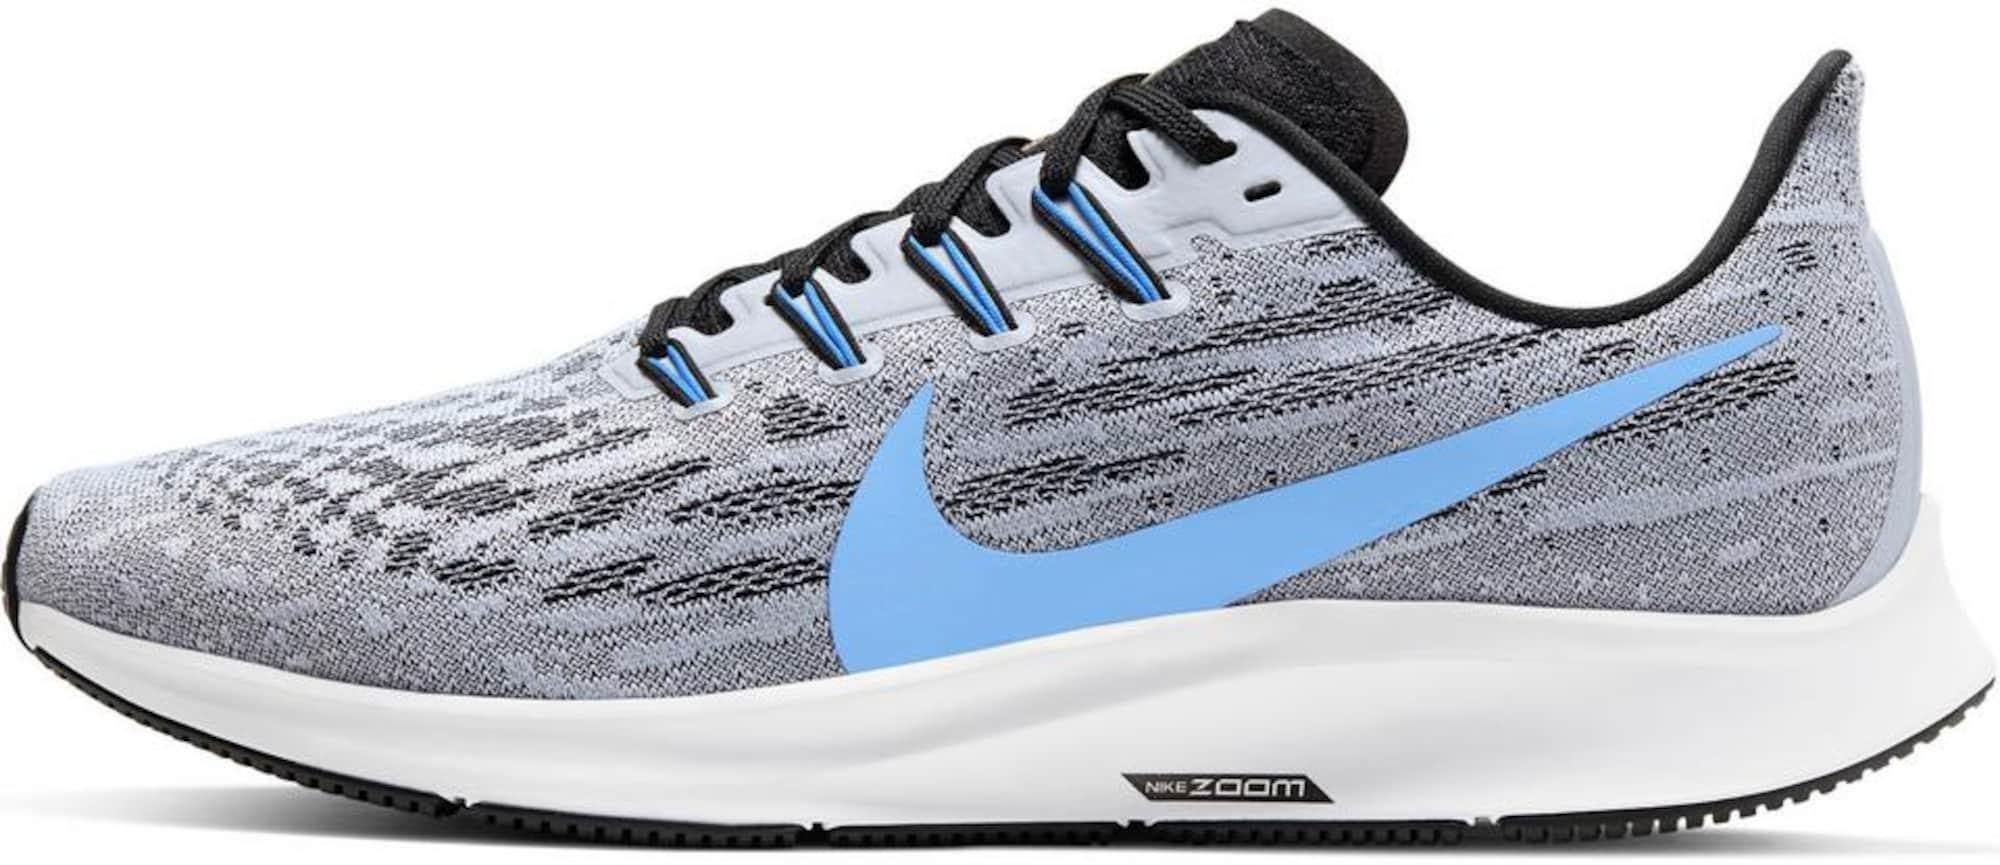 NIKE Bėgimo batai 'Pegasus 36' melsvai pilka / mėlyna dūmų spalva